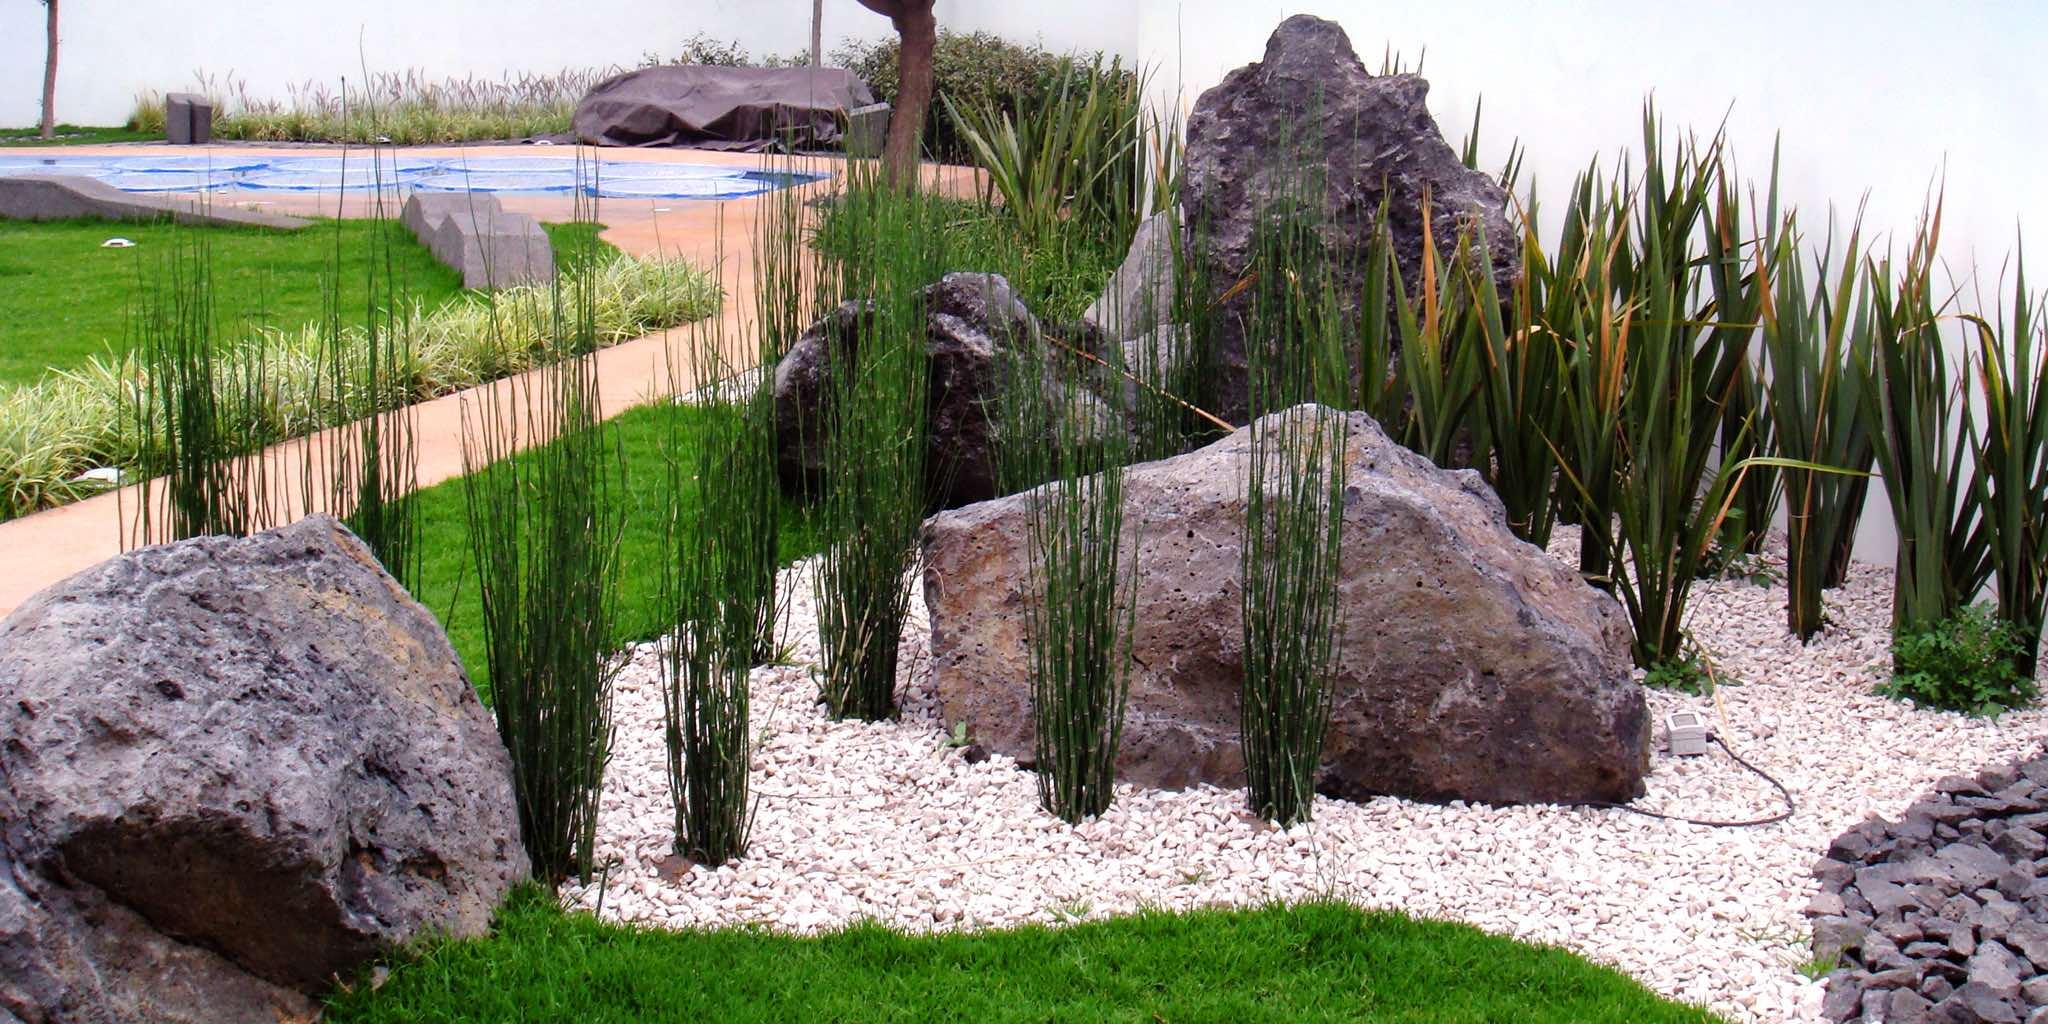 Dise o jard n ideas verdes for Diseno de jardines uruguay